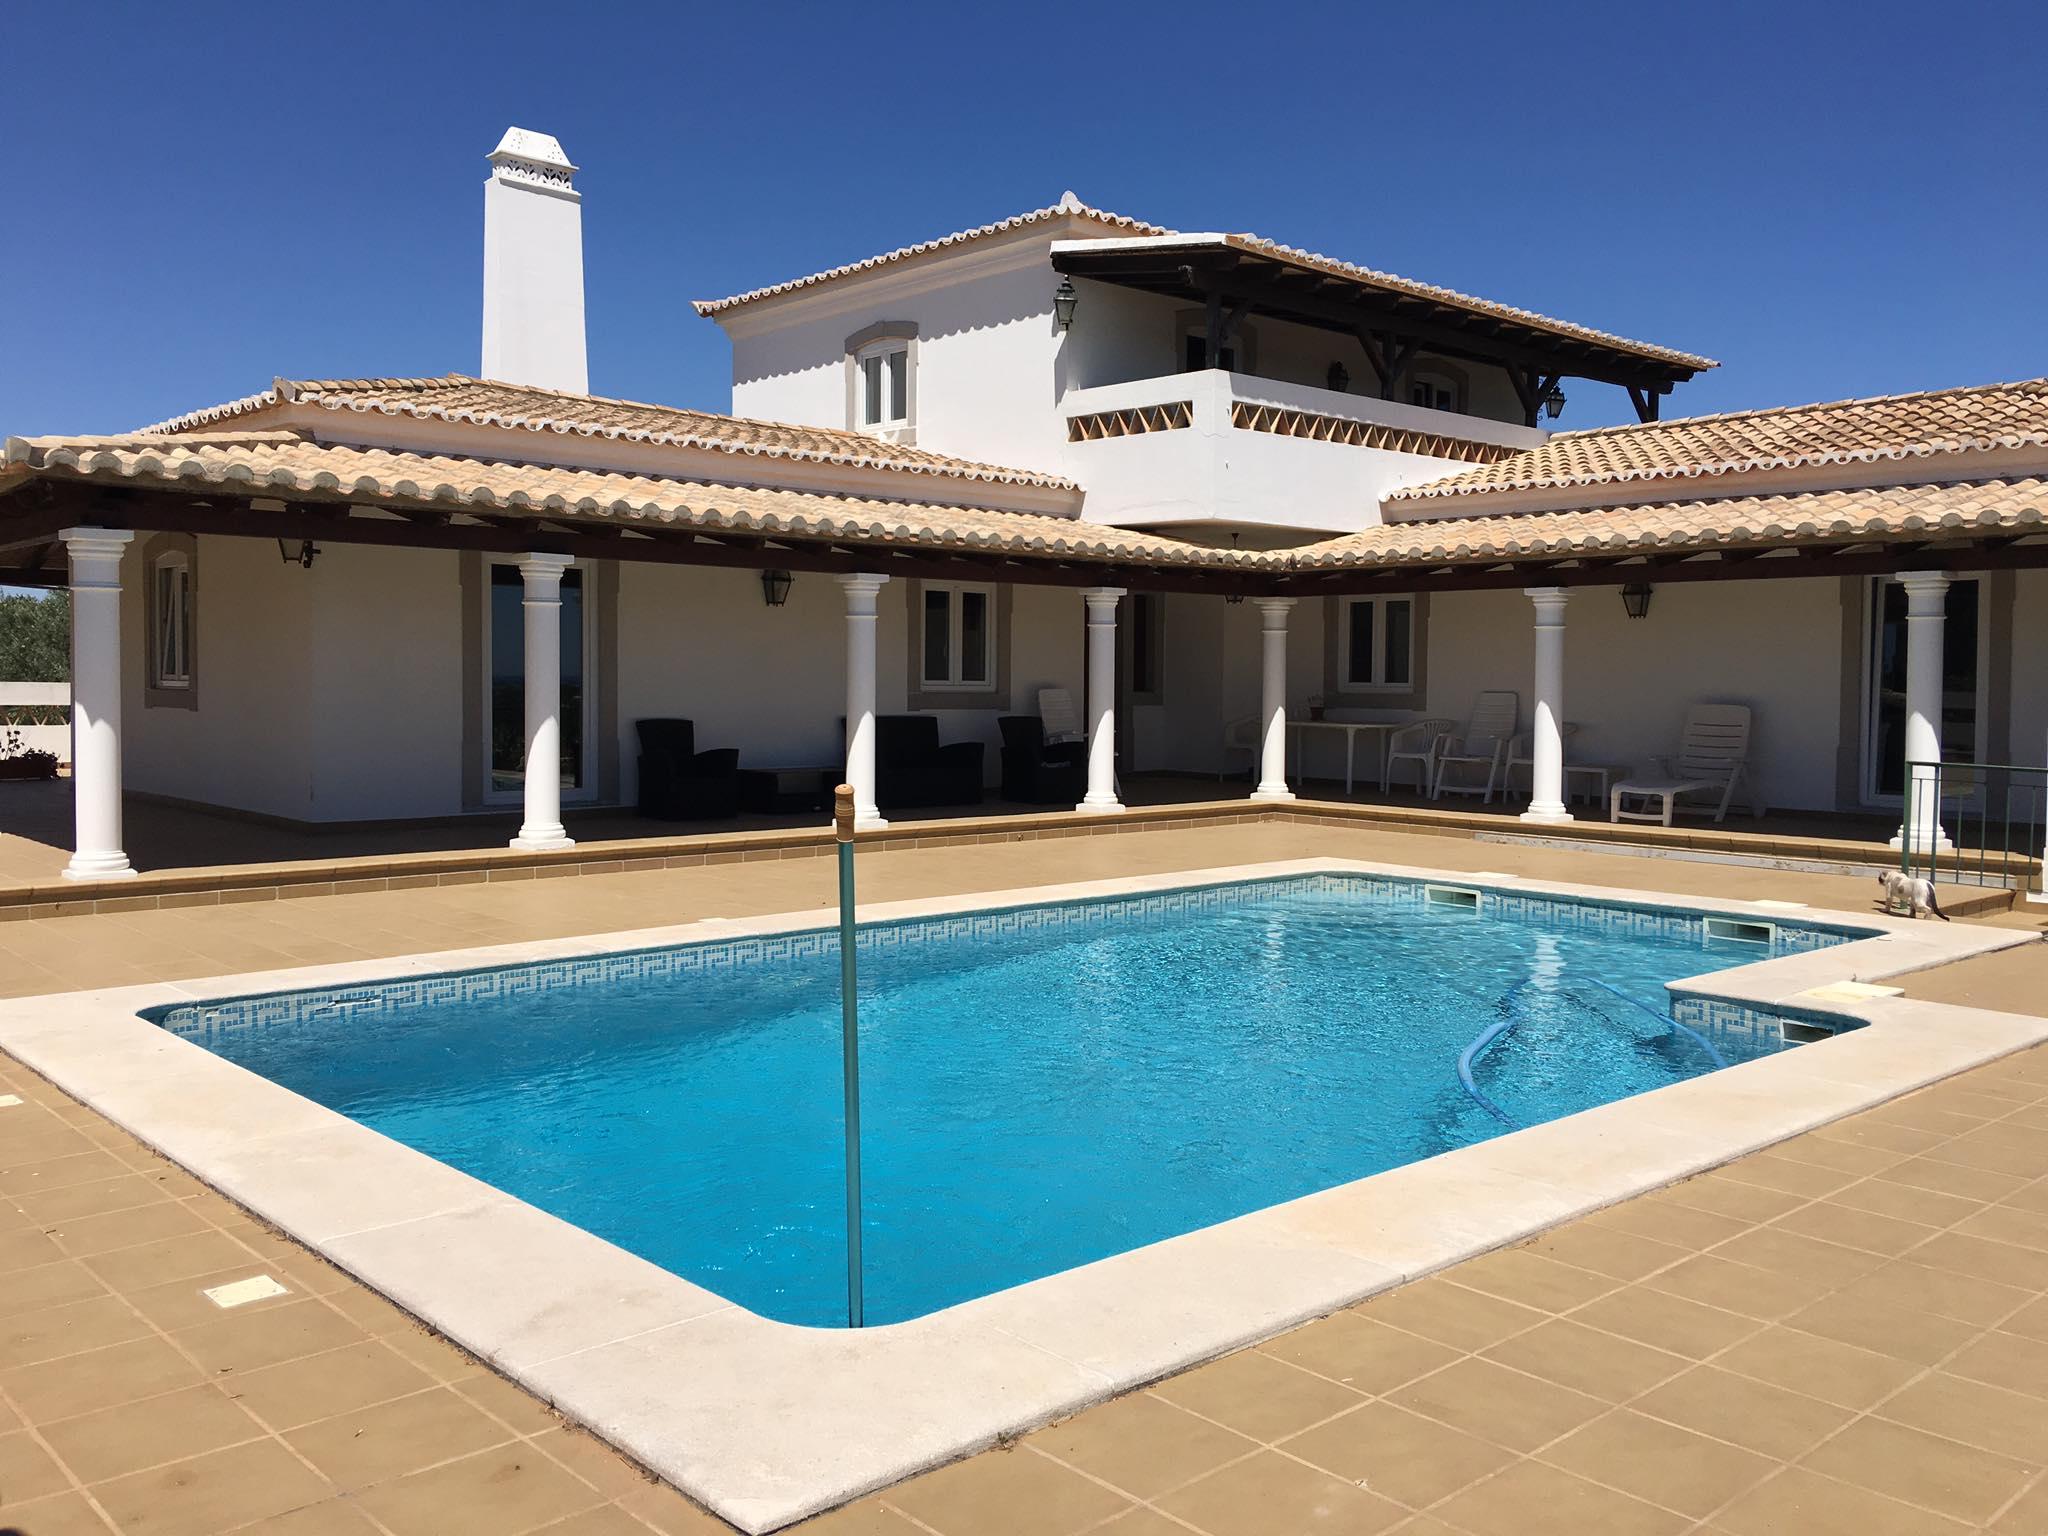 Location maison algarve portugal avec piscine ventana blog - Location maison algarve avec piscine ...